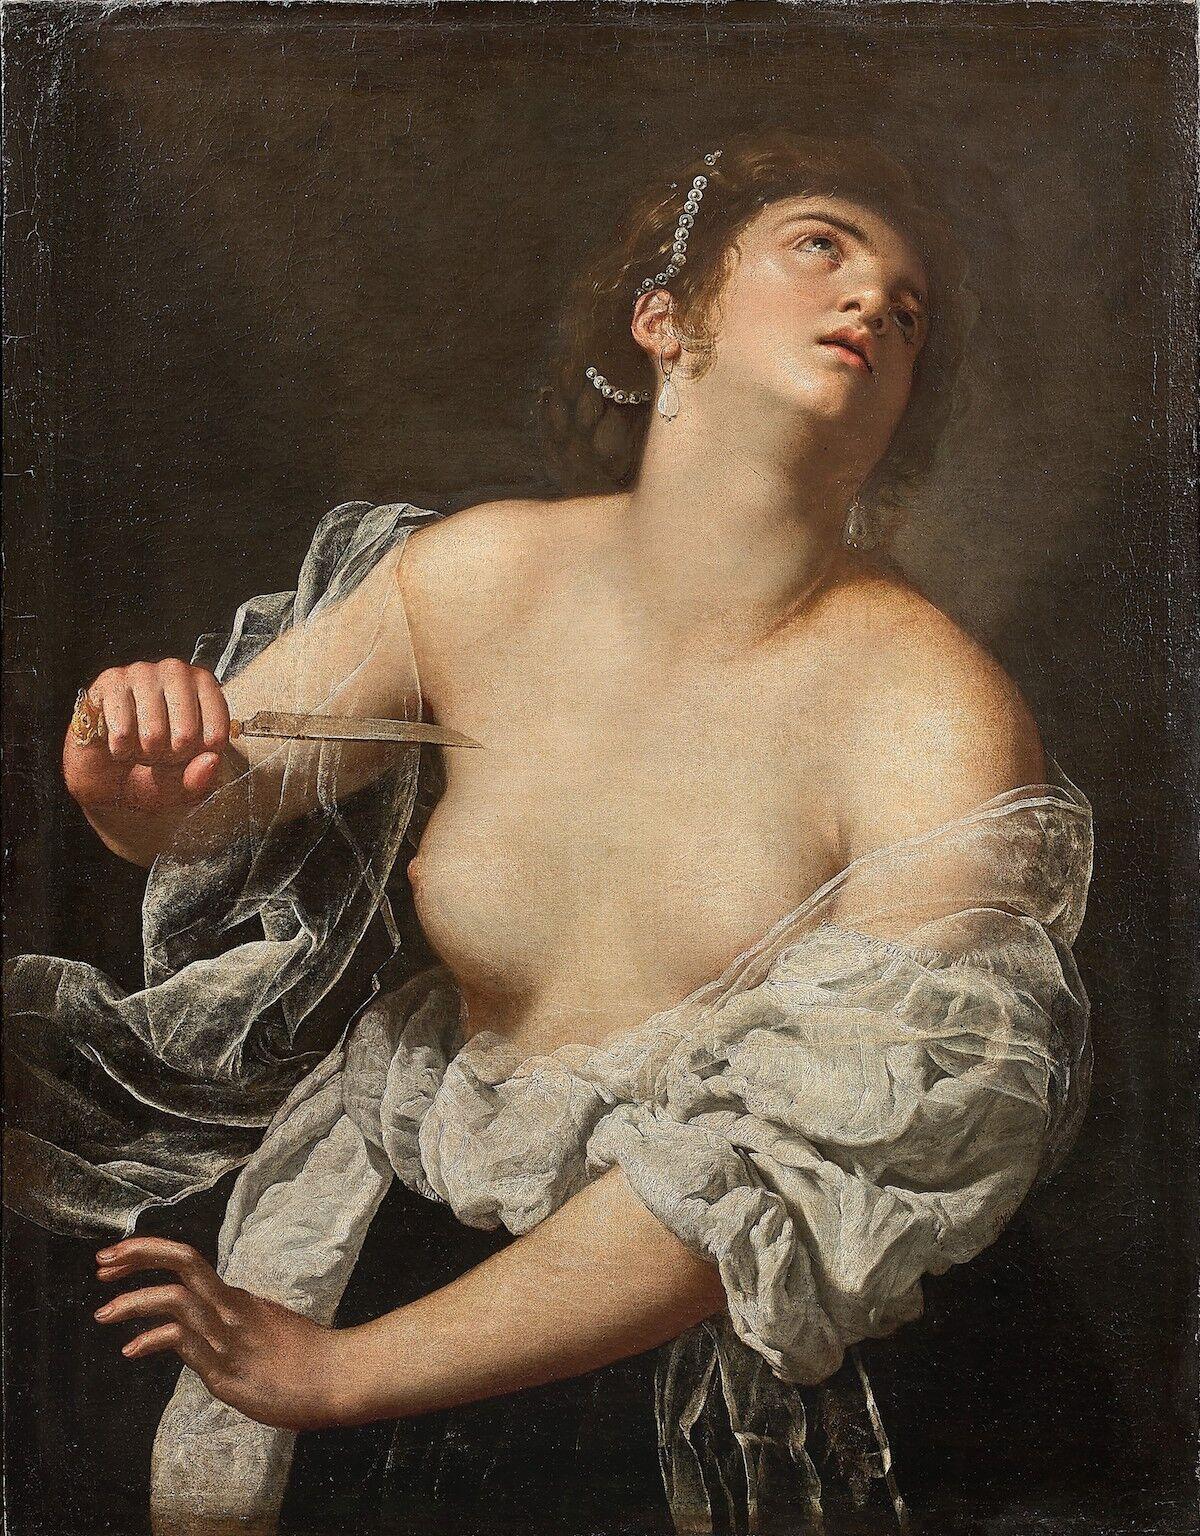 Artemisia Gentileschi, Lucretia, ca. 1630. Est. €600,000–€800,000 ($656,000–$875,000). Courtesy Artcurial.